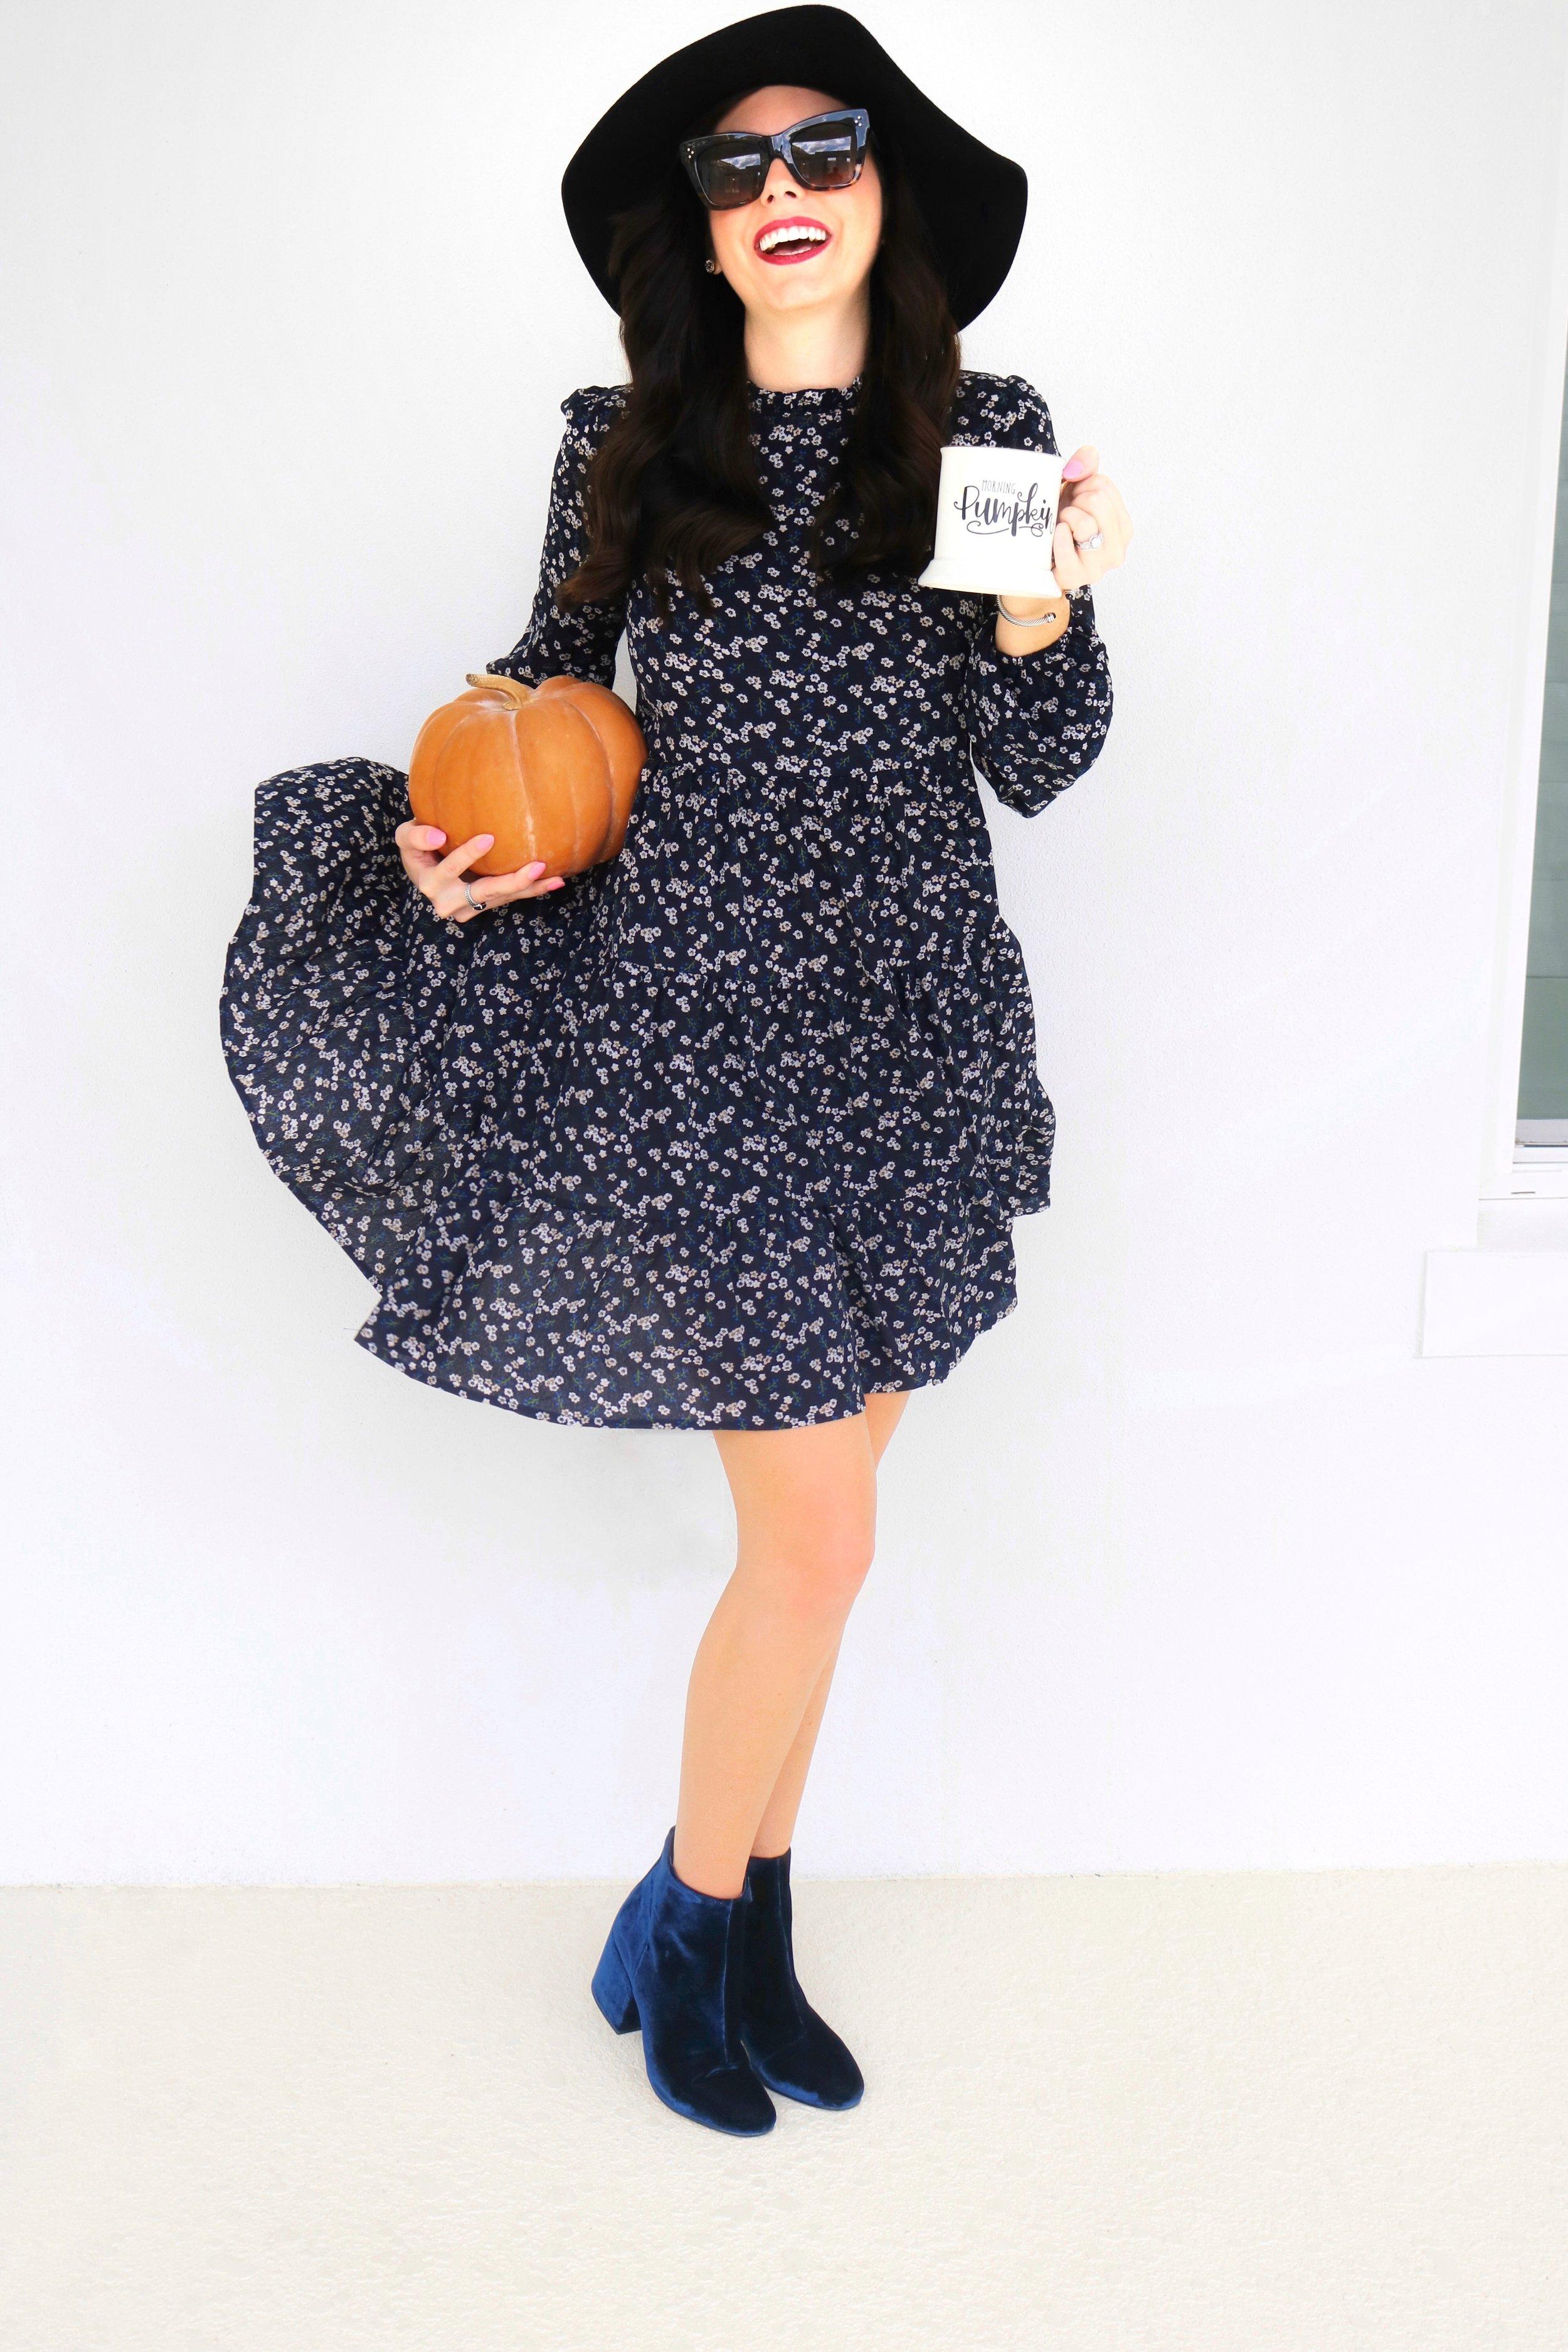 november navy floral dress.jpg